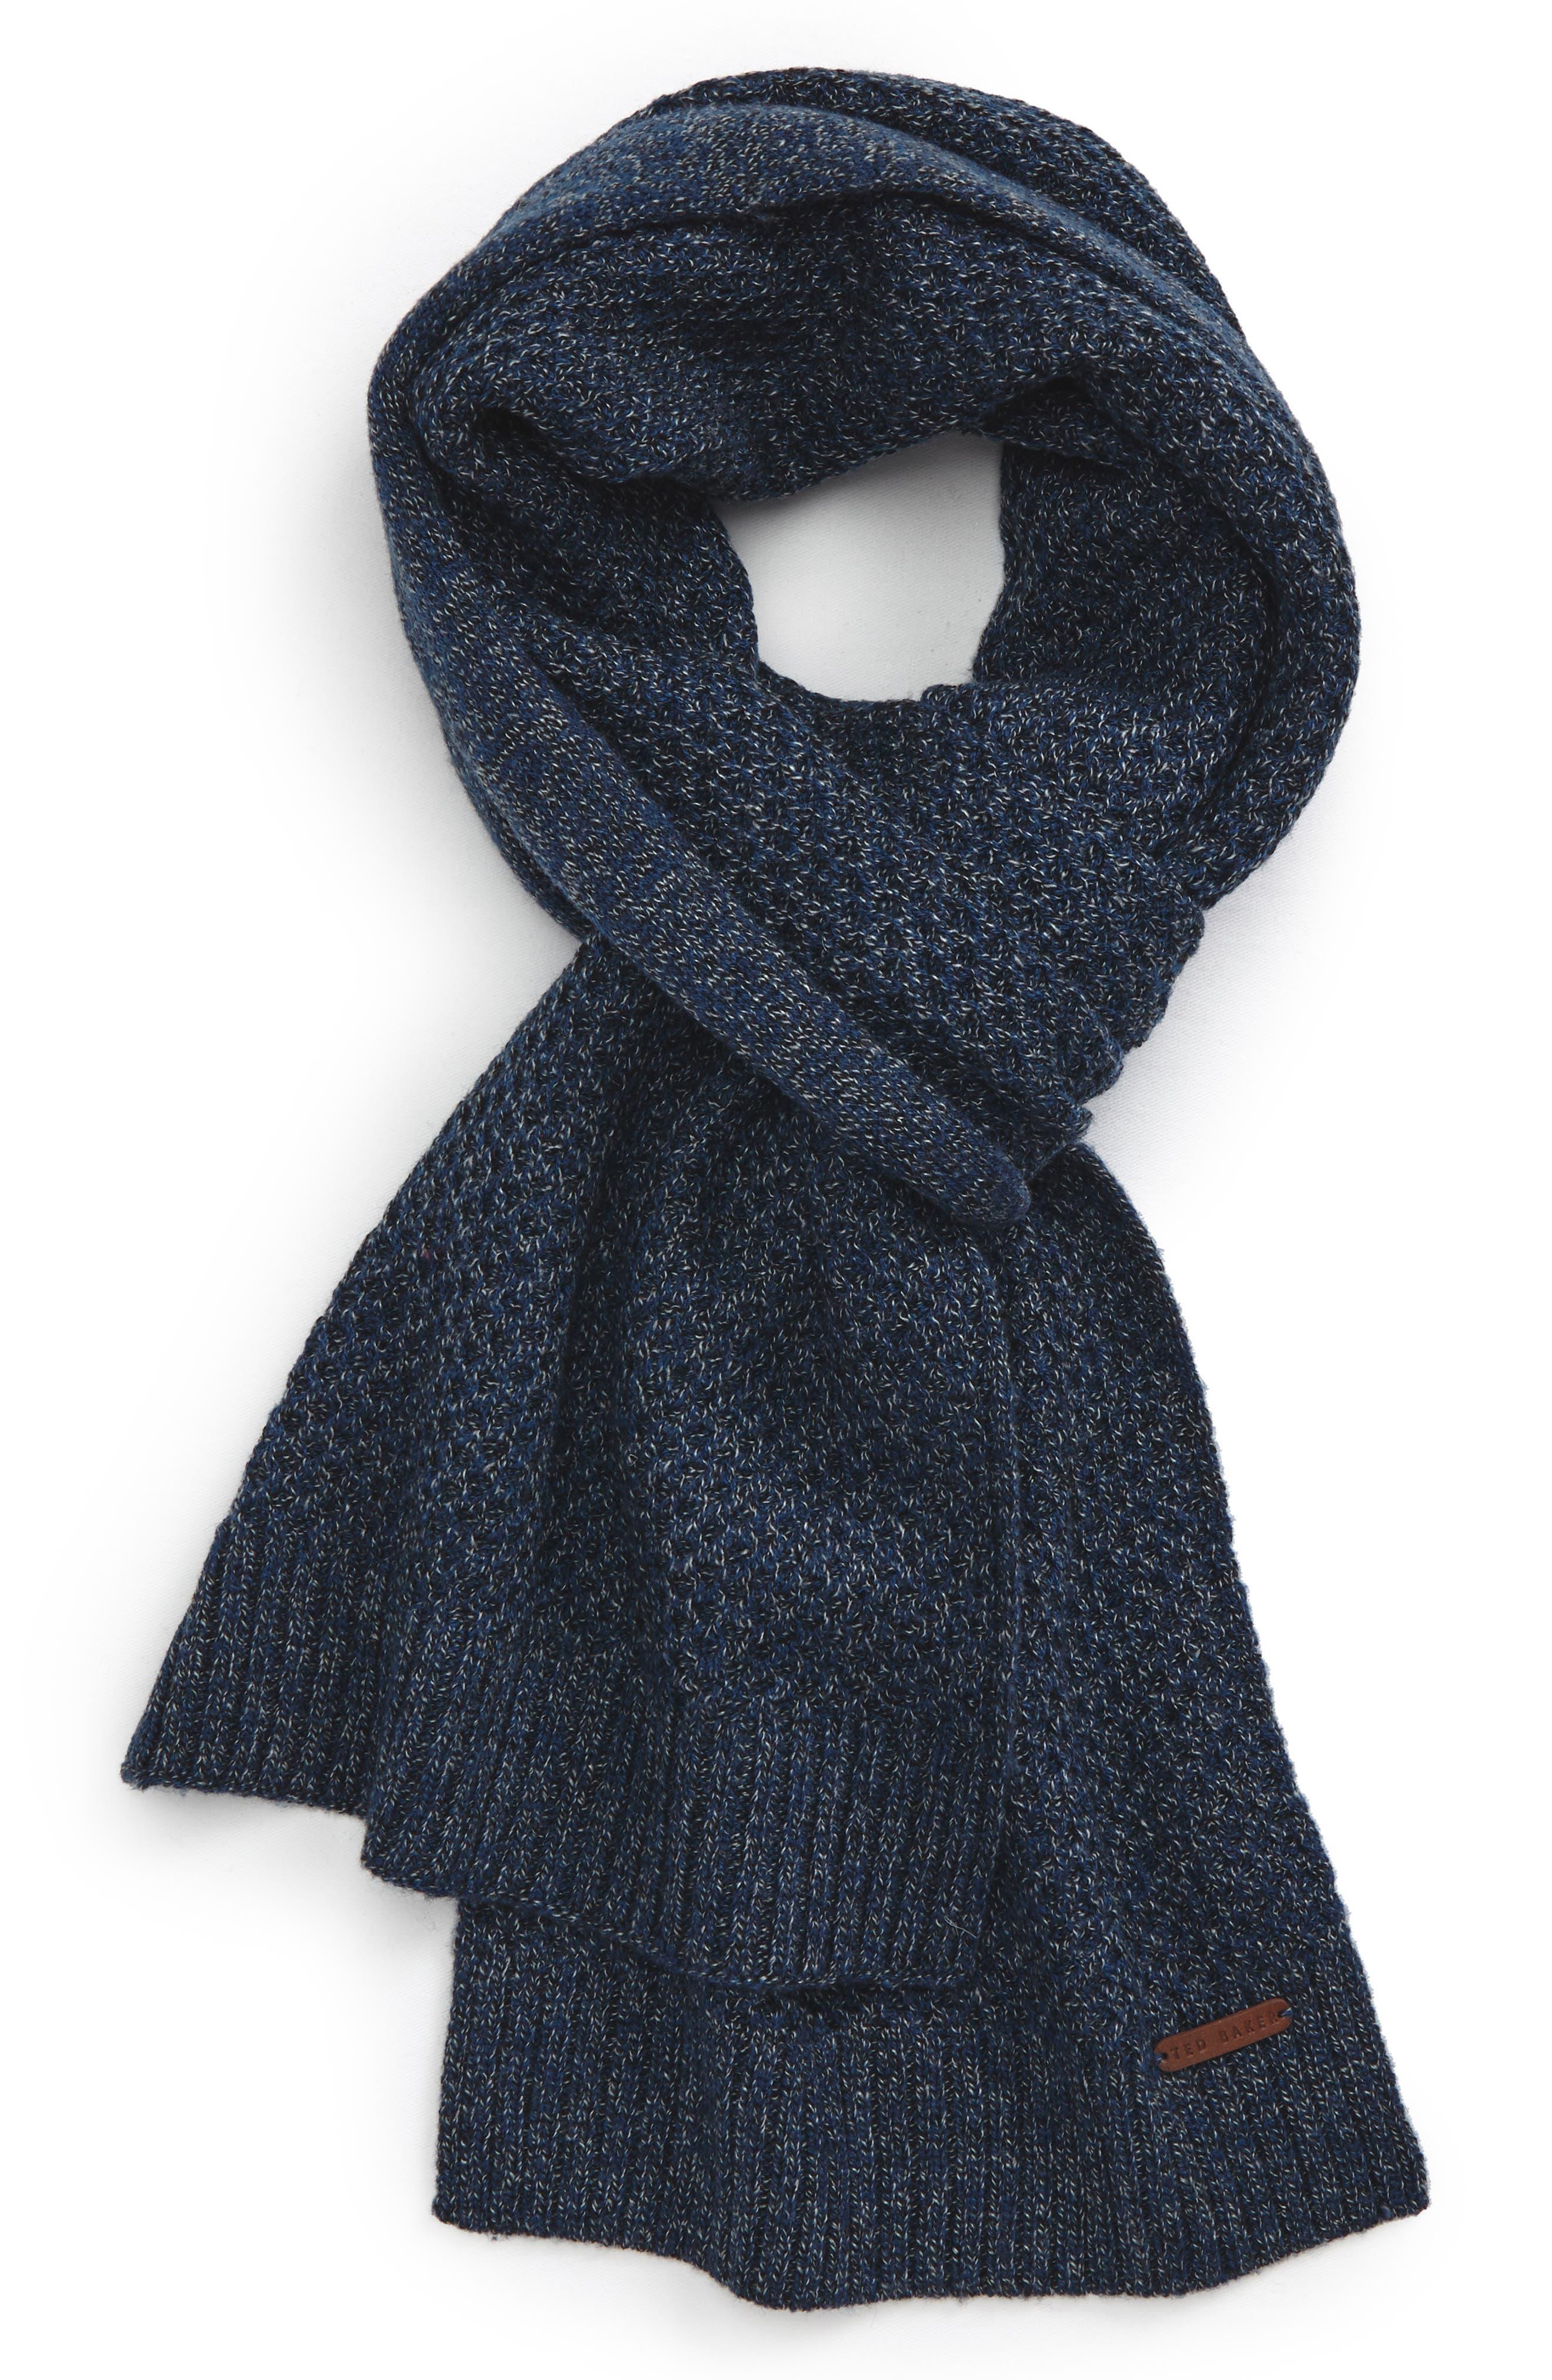 Kapok Wool Blend Scarf,                             Main thumbnail 1, color,                             Teal-Blue